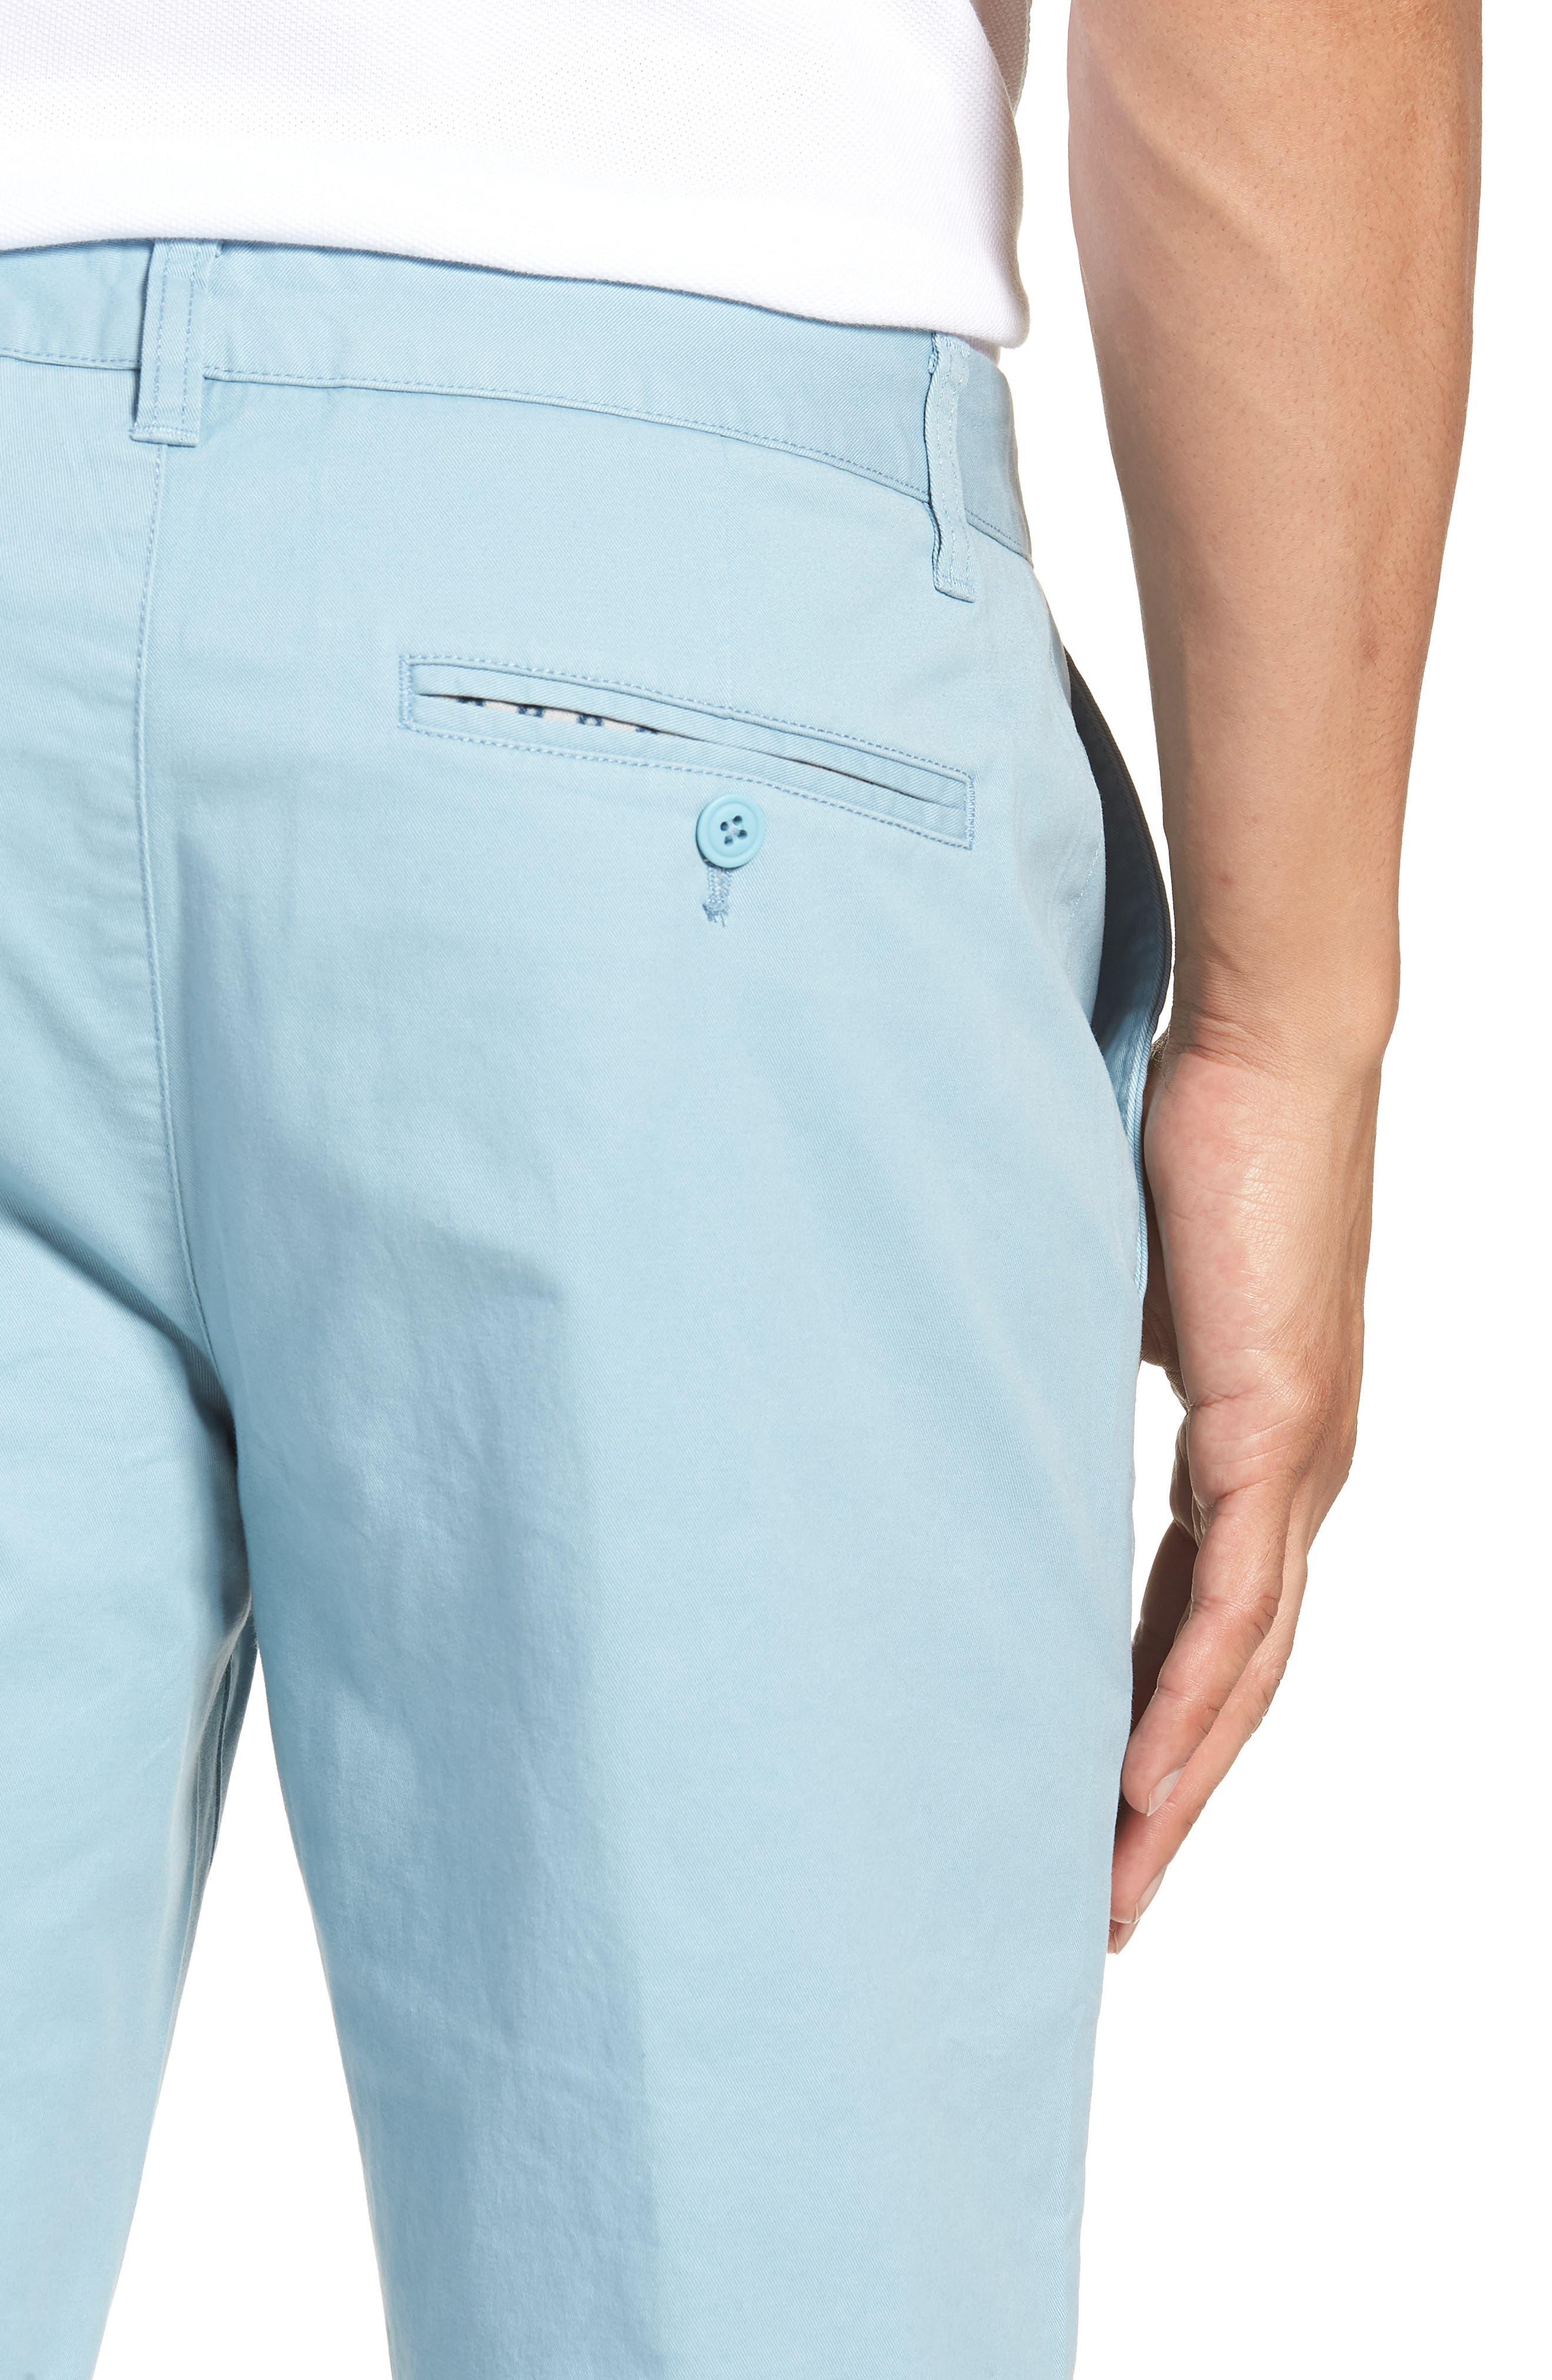 Delaware Slim Fit Structure Jeans,                             Alternate thumbnail 12, color,